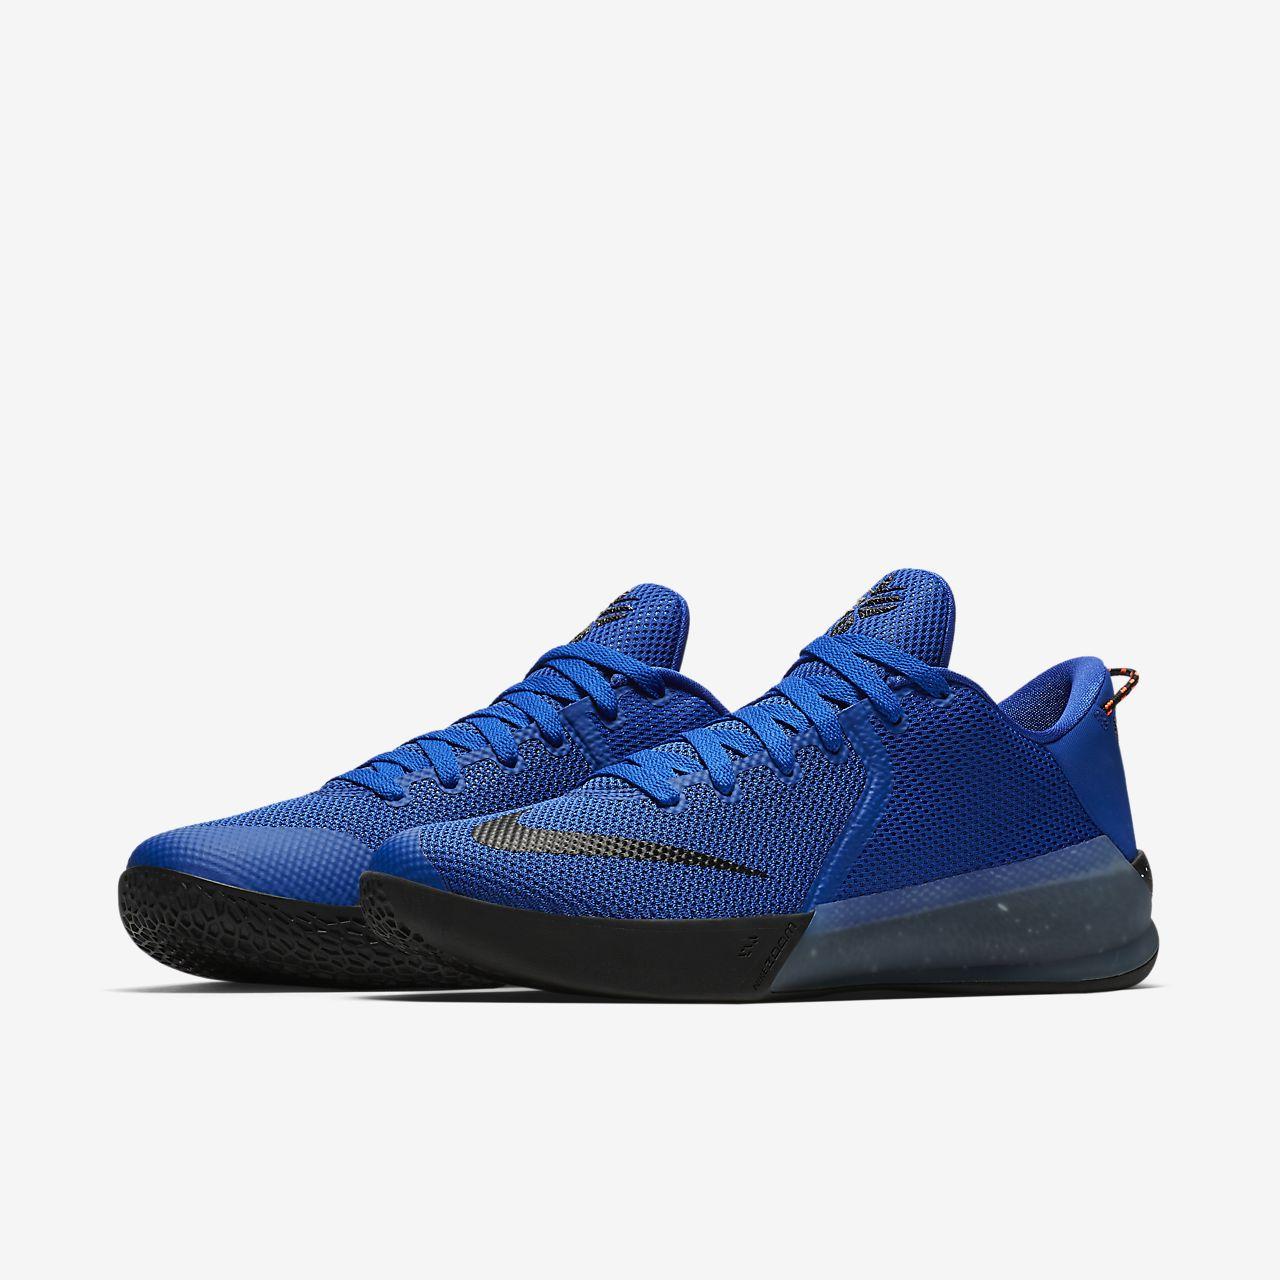 low priced e2182 c4a85 Nike Zoom Kobe Venomenon 6